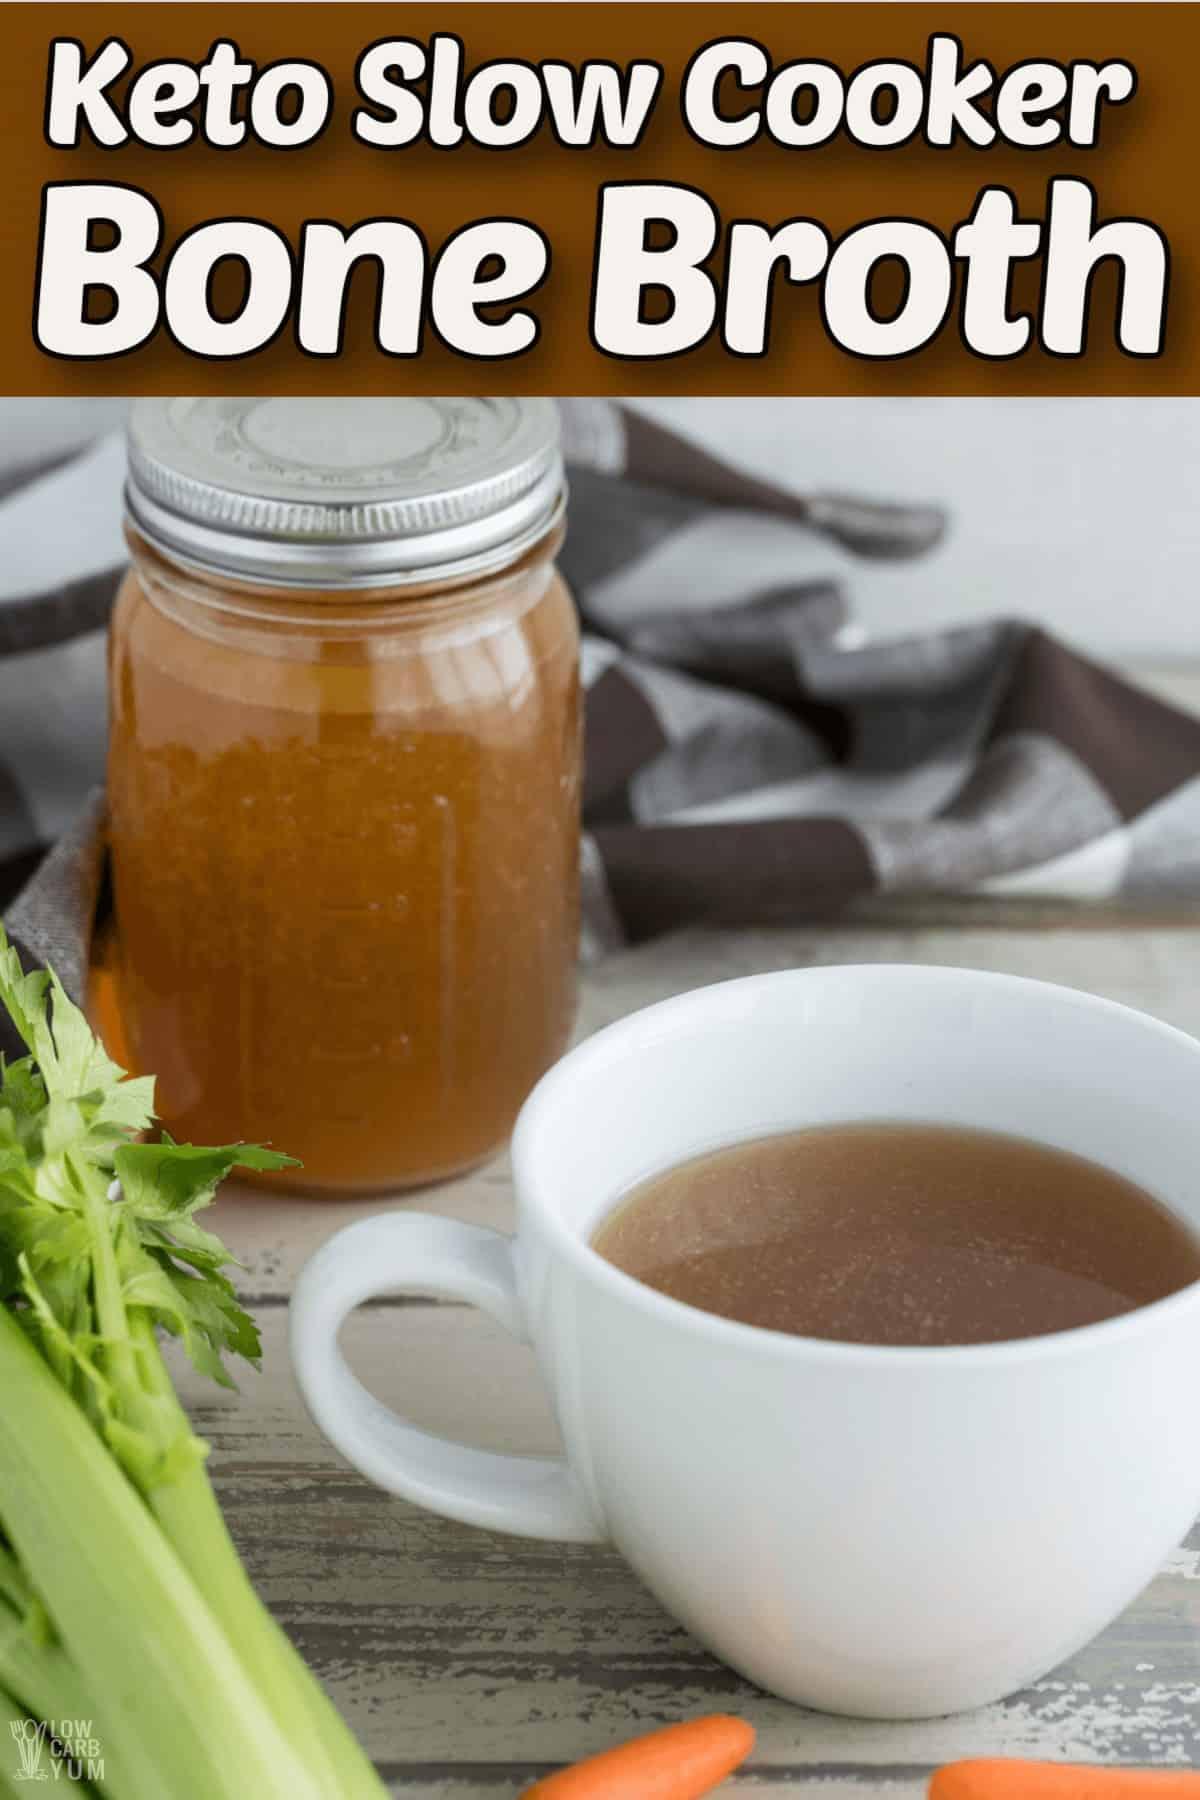 keto bone broth recipe